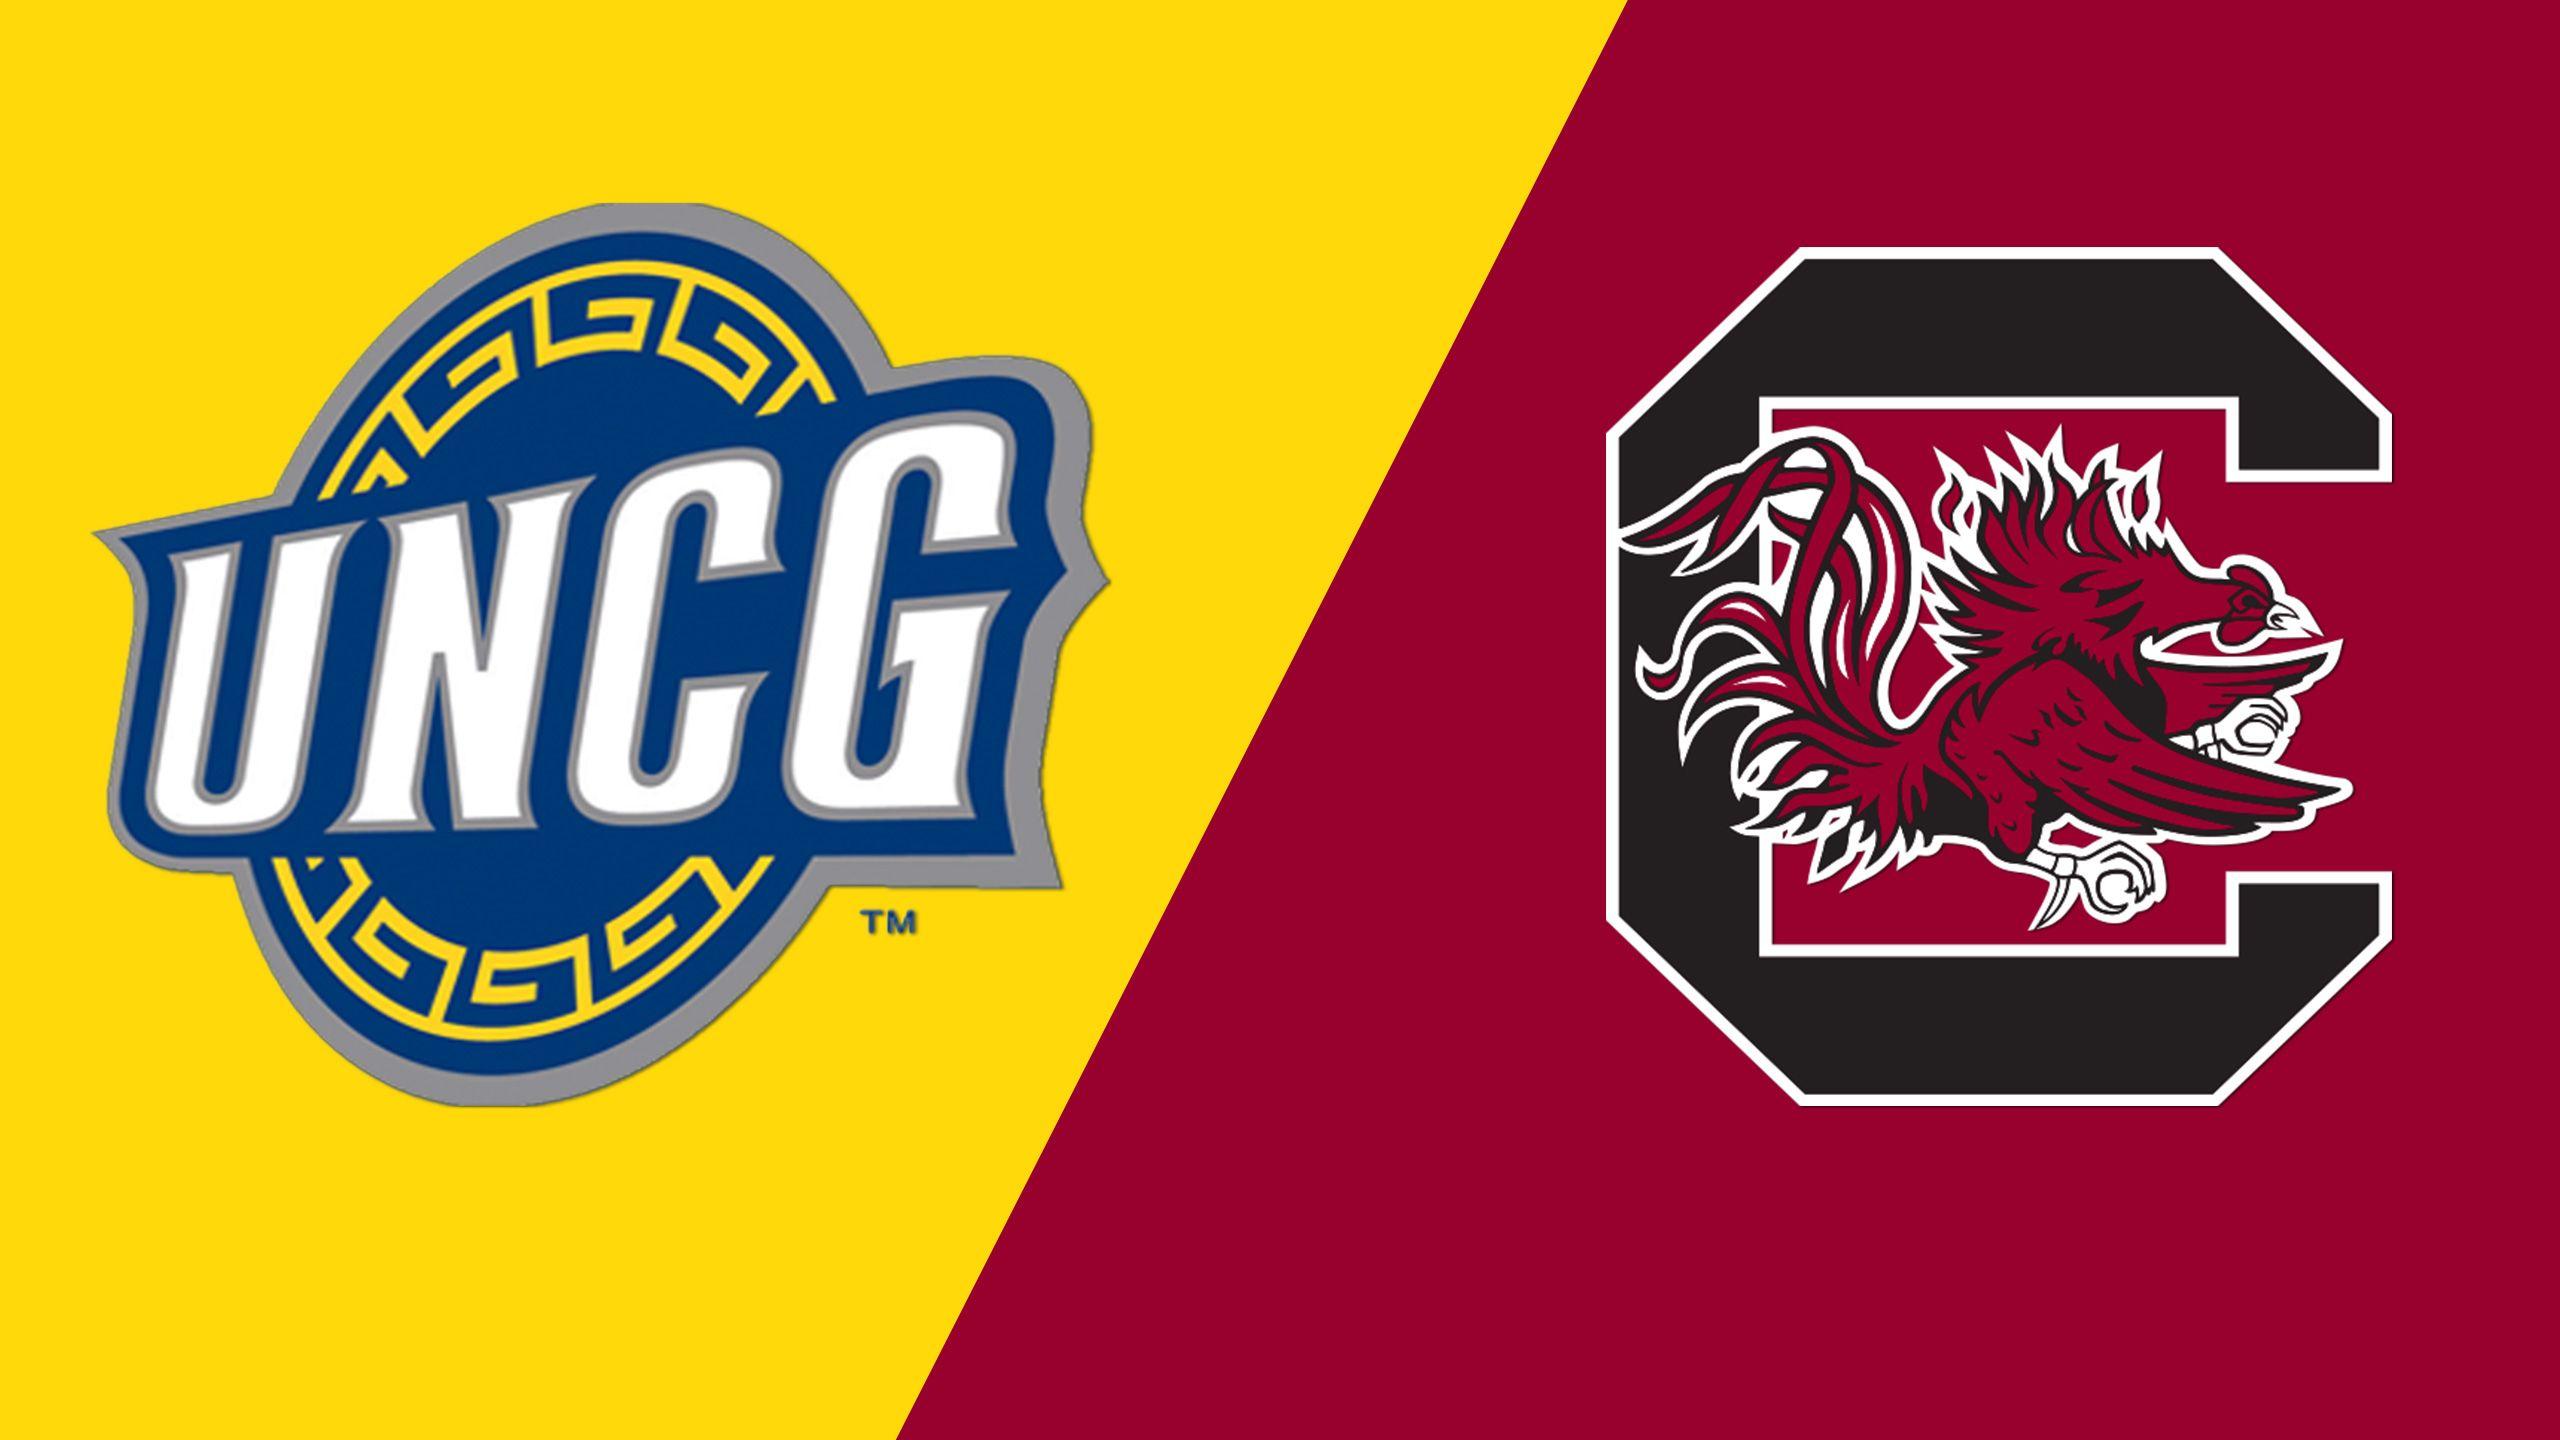 UNC Greensboro vs. #9 South Carolina (Site 10 / Game 2) (NCAA Softball Championship)